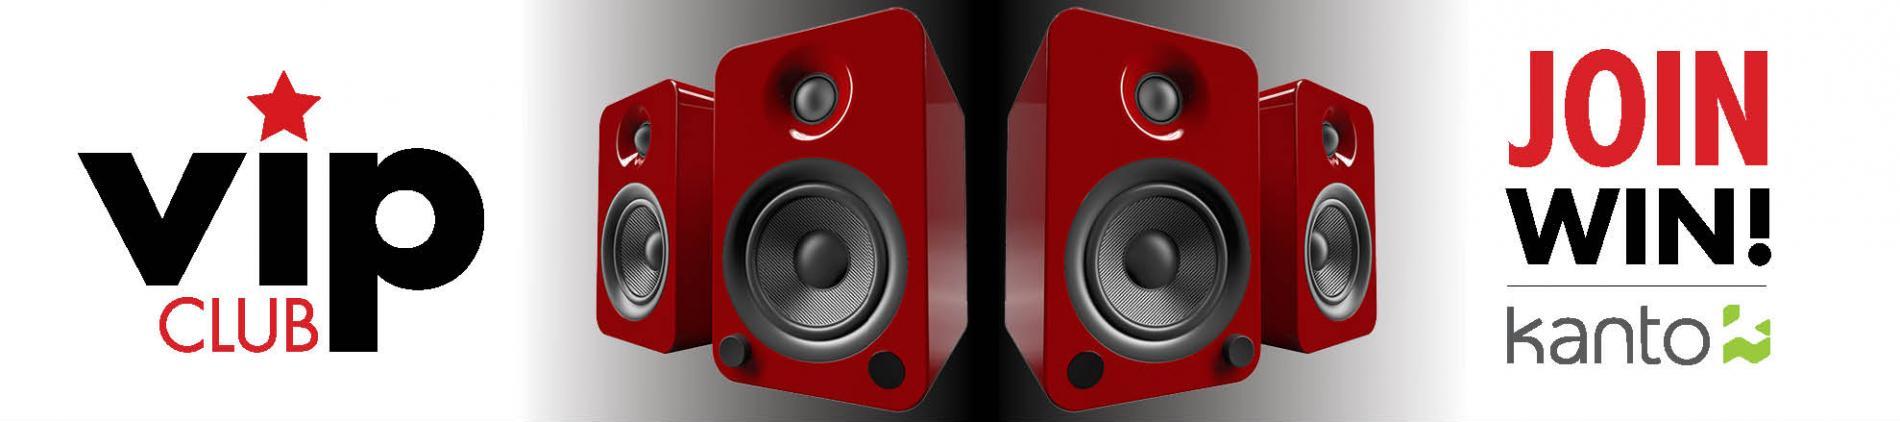 AVU VIP Club, Kanto Speakers, Fall, Contest, Win